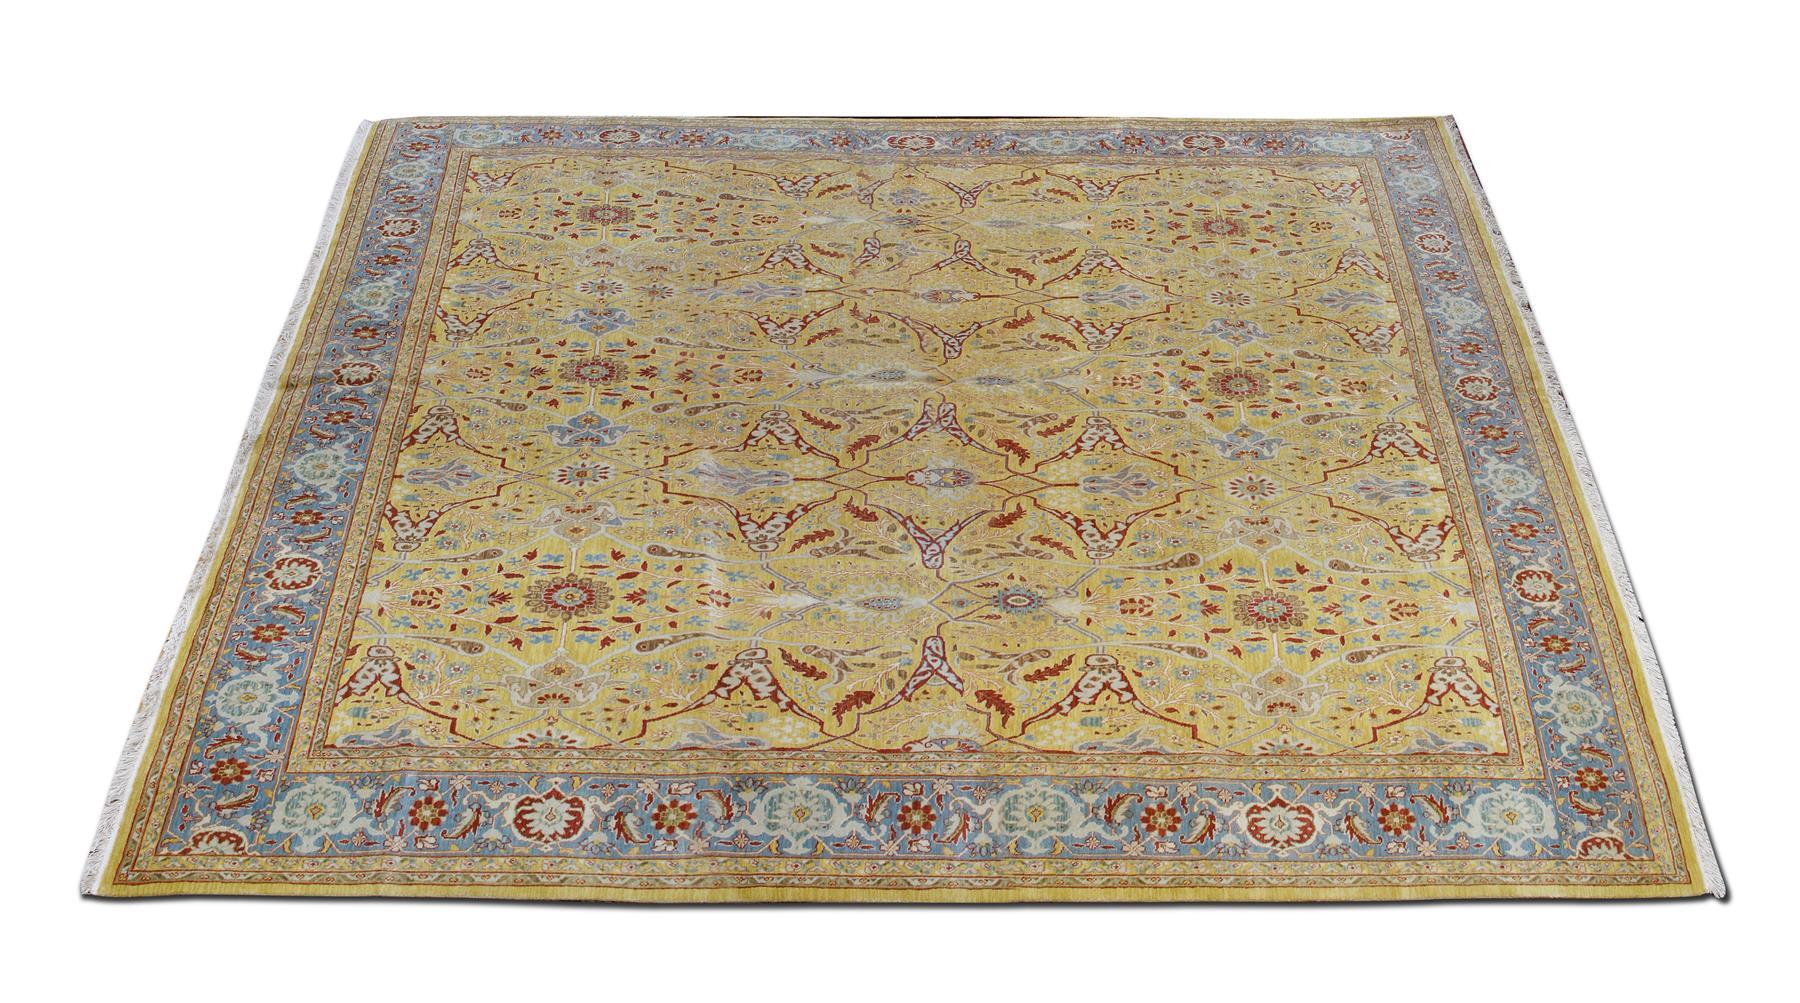 FINE PERSIAN DESIGN ROOMSIZE CARPET